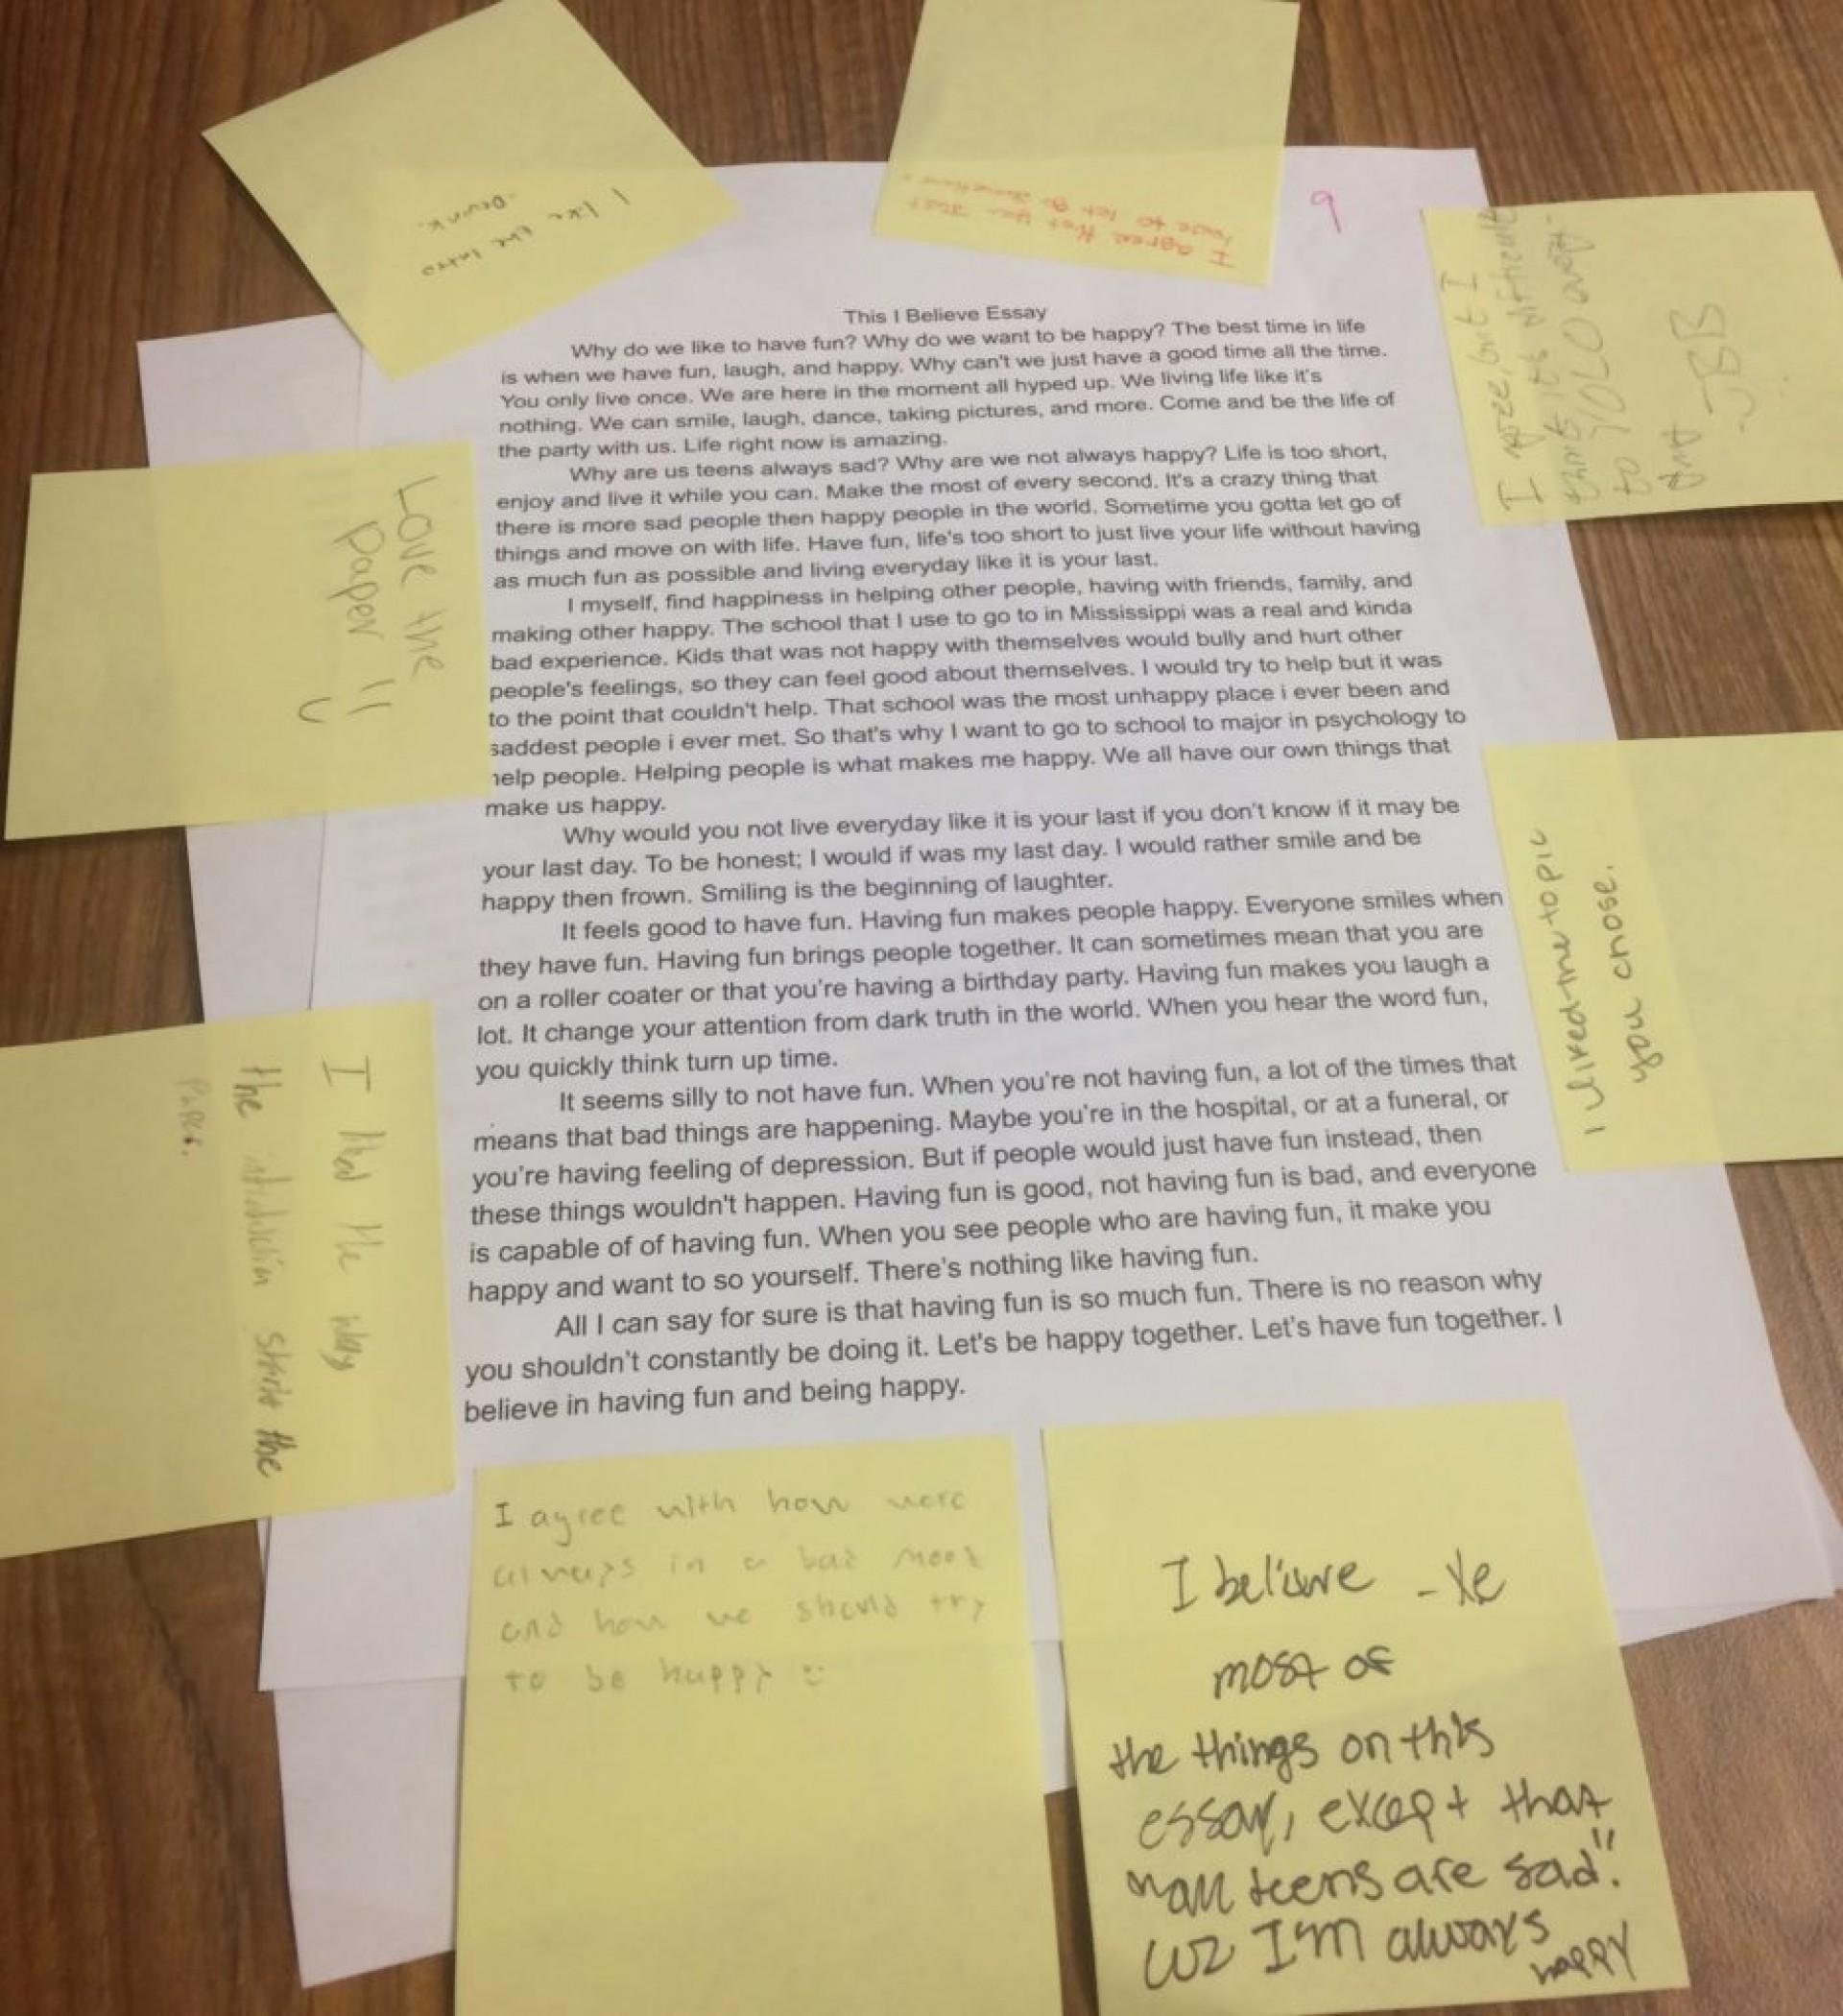 004 This I Believe Essays 936x1024 Stupendous Essay Examples Npr College 1920